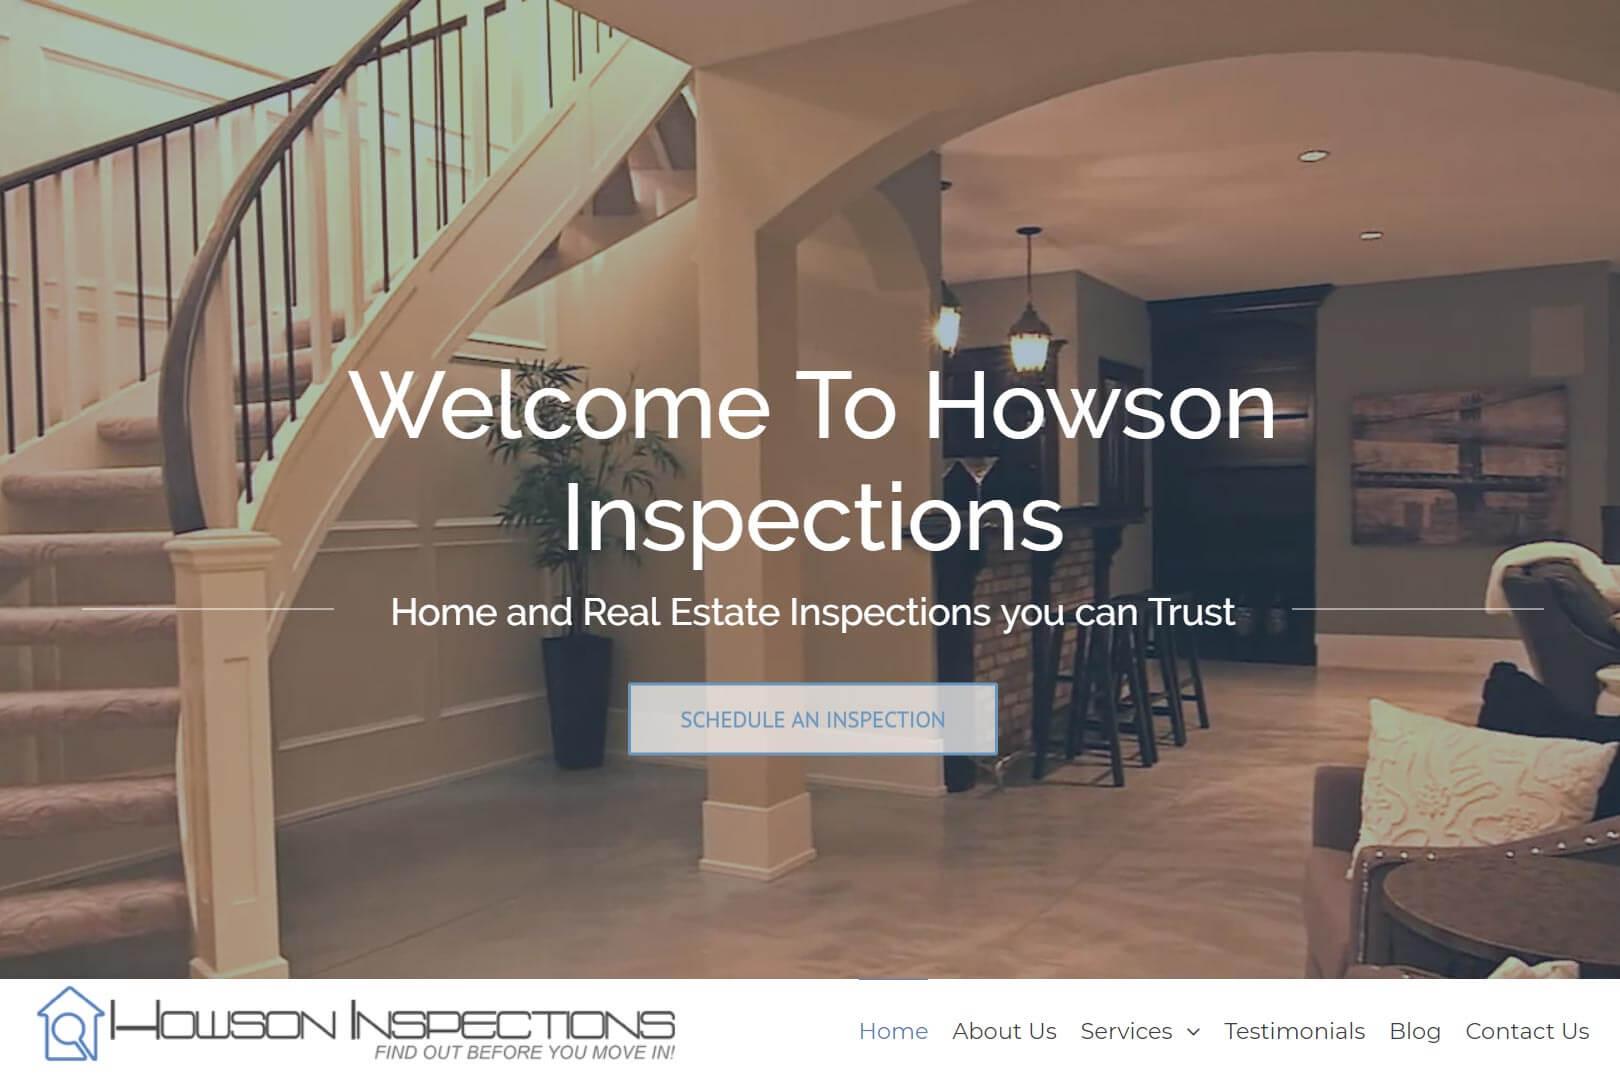 A Visually Striking Home Inspection Website. Skills